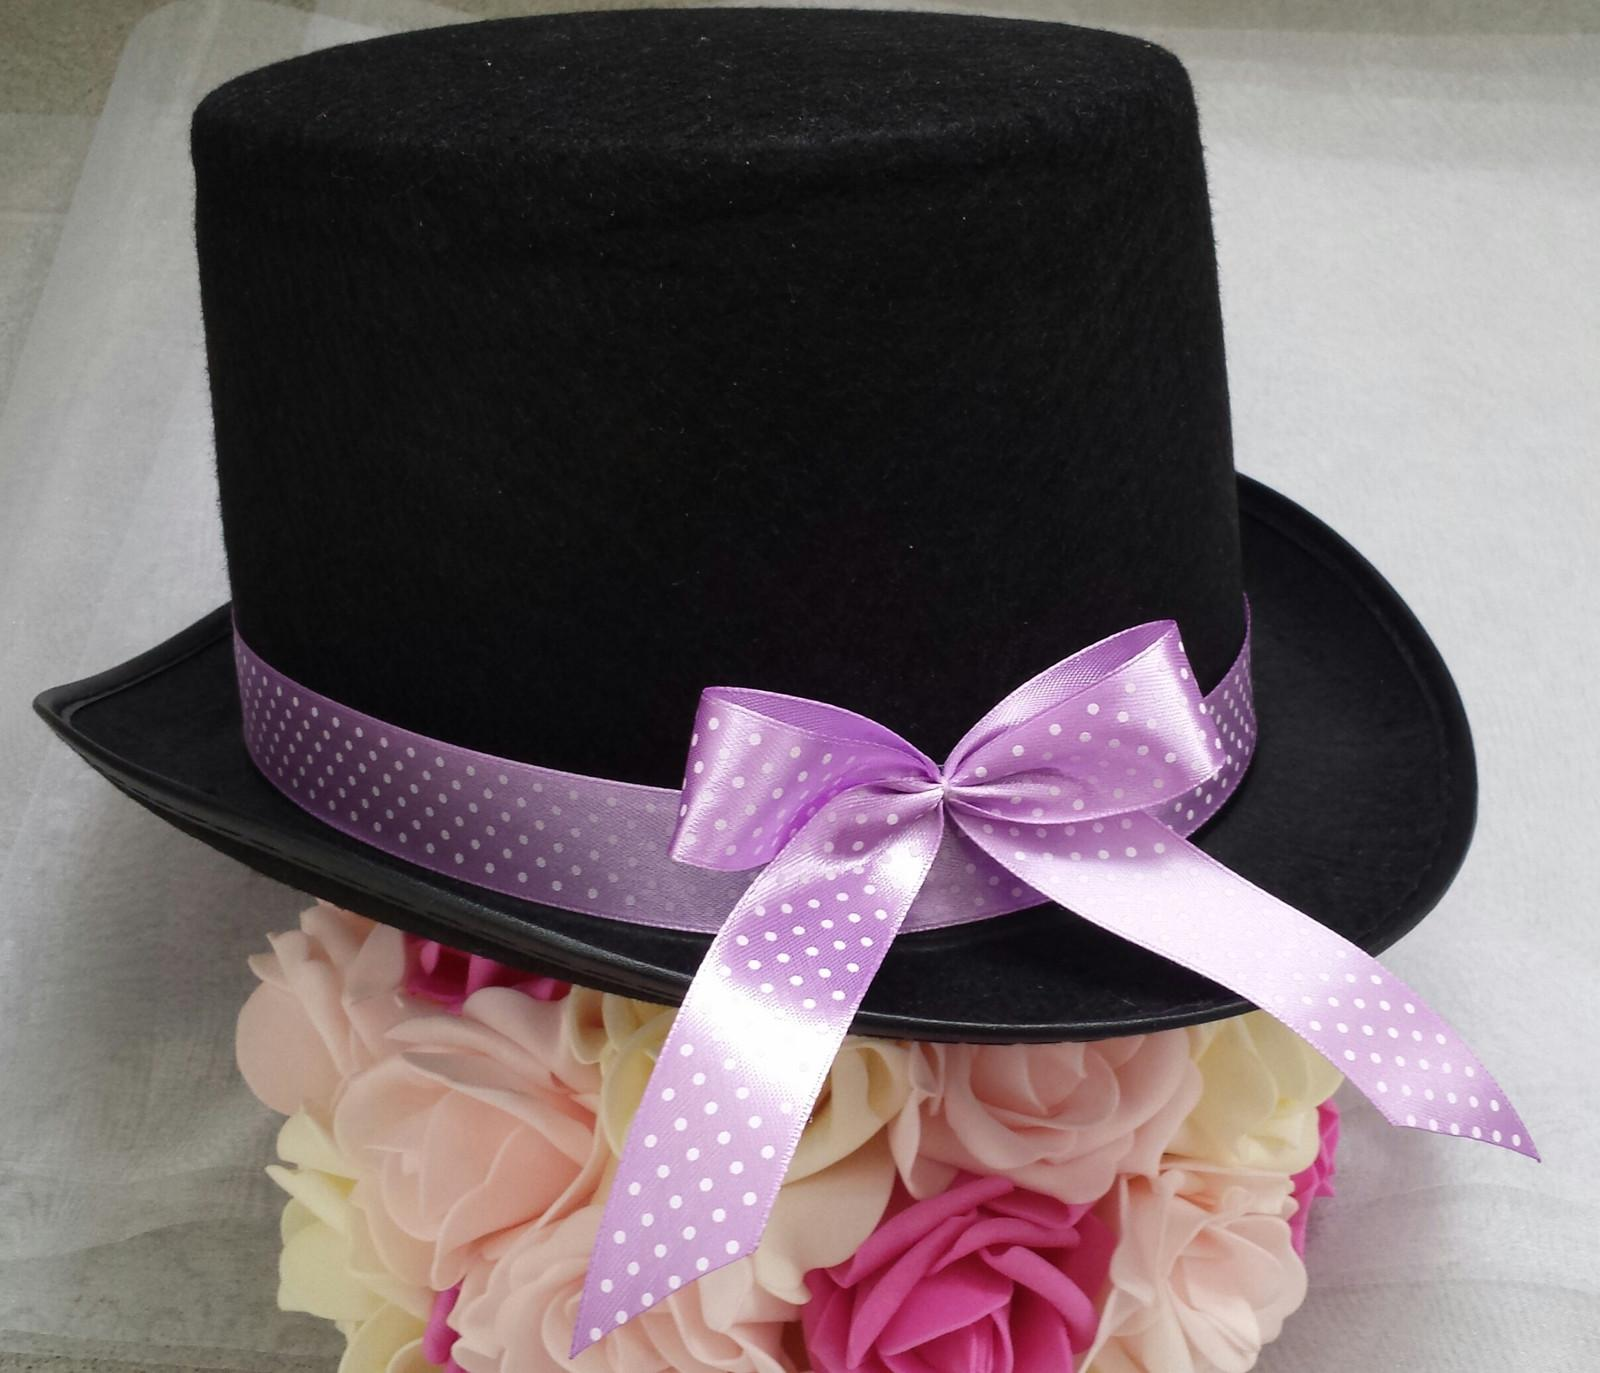 Luxusni bily polstarek s KANZASHI květinkou - Obrázek č. 3